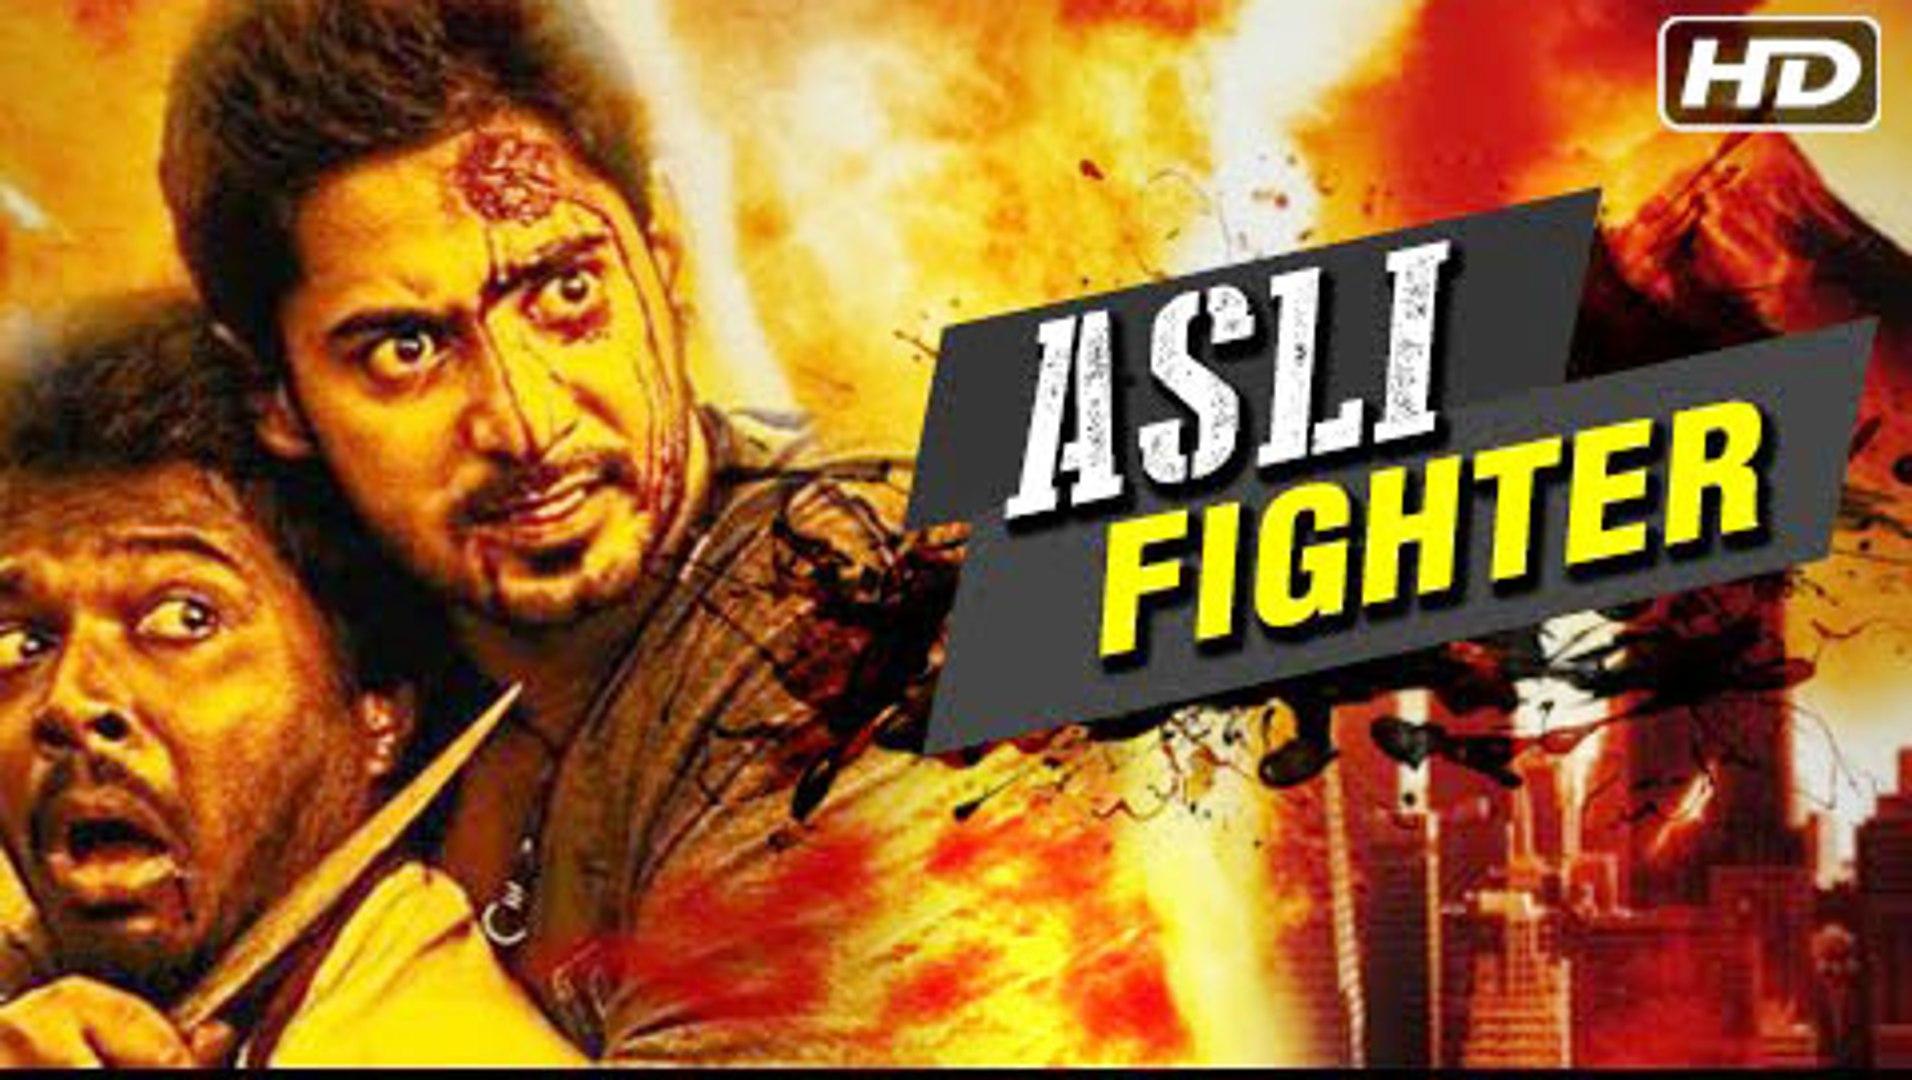 Asli Fighter 2015 Hindi Dubbed Part 2 3